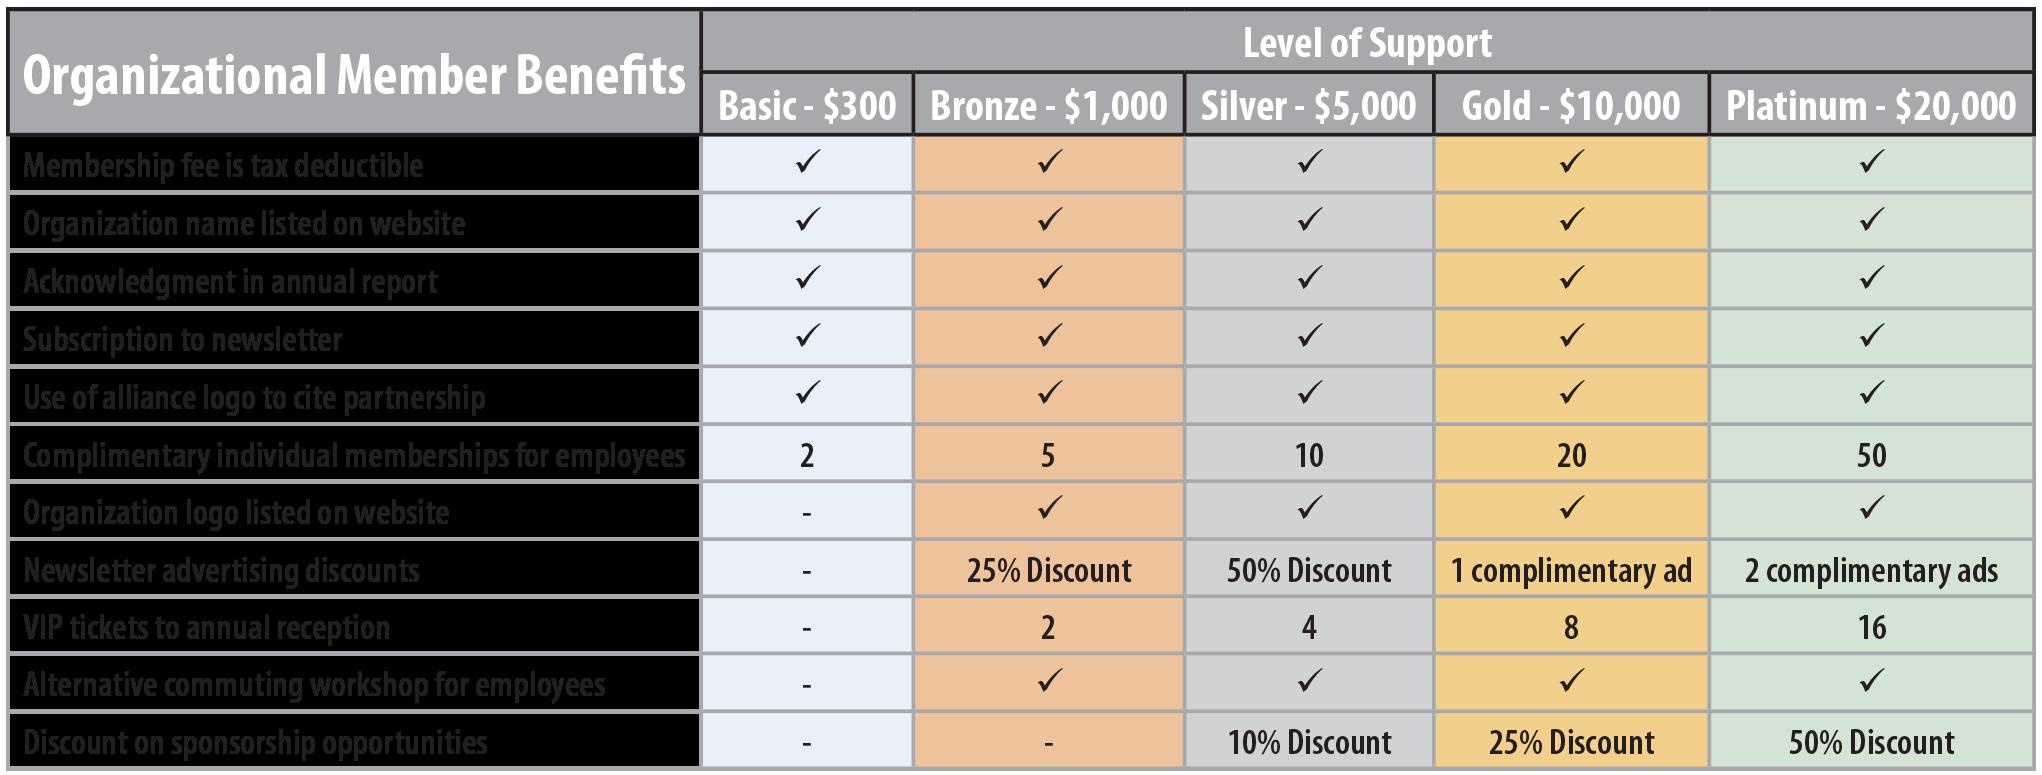 TCA_Benefits_Table_Organization(1).png